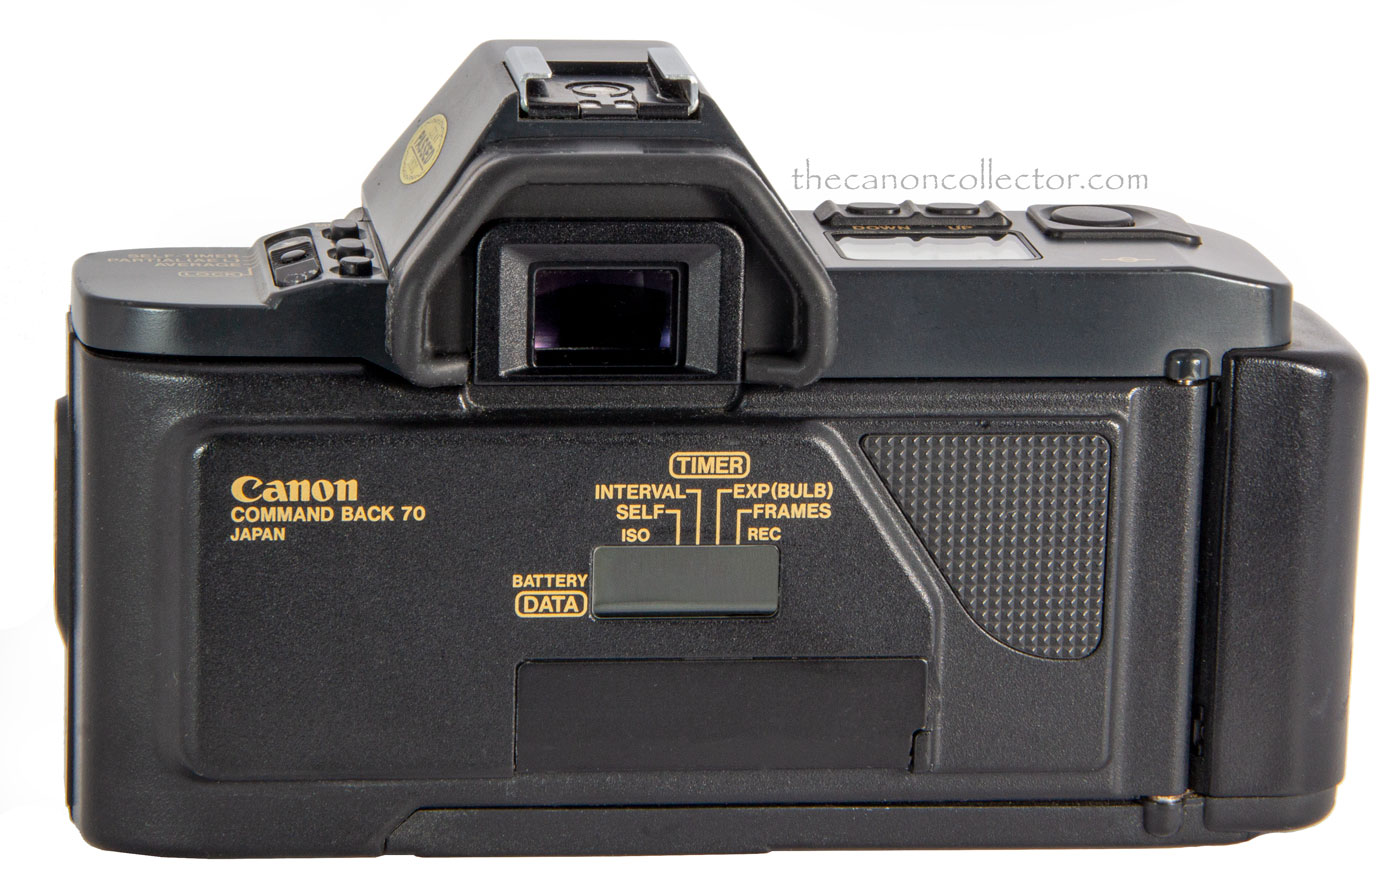 Canon Command Back 70